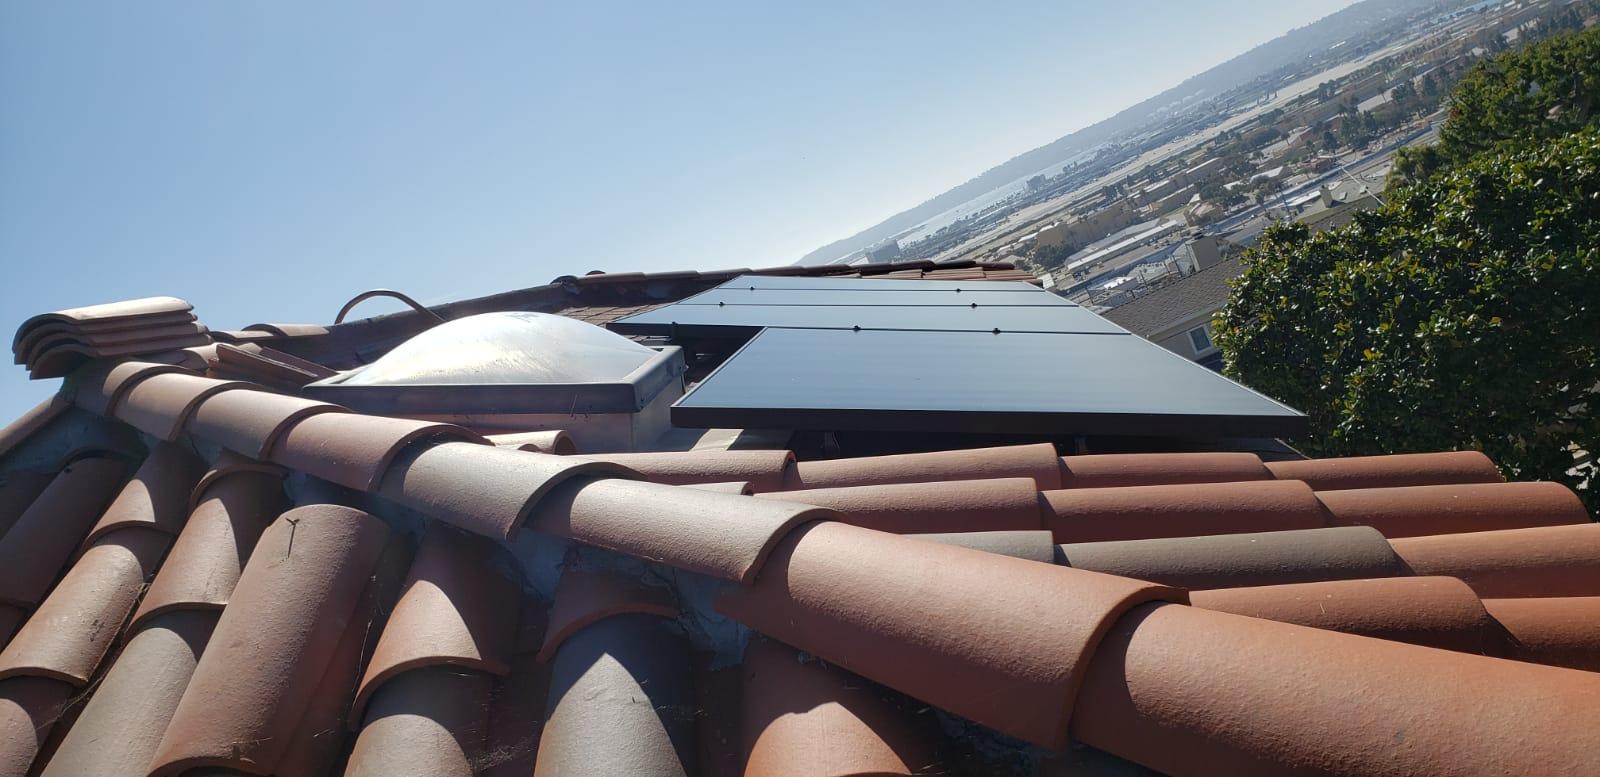 Sunlight Solar System Installation San Diego Image 5